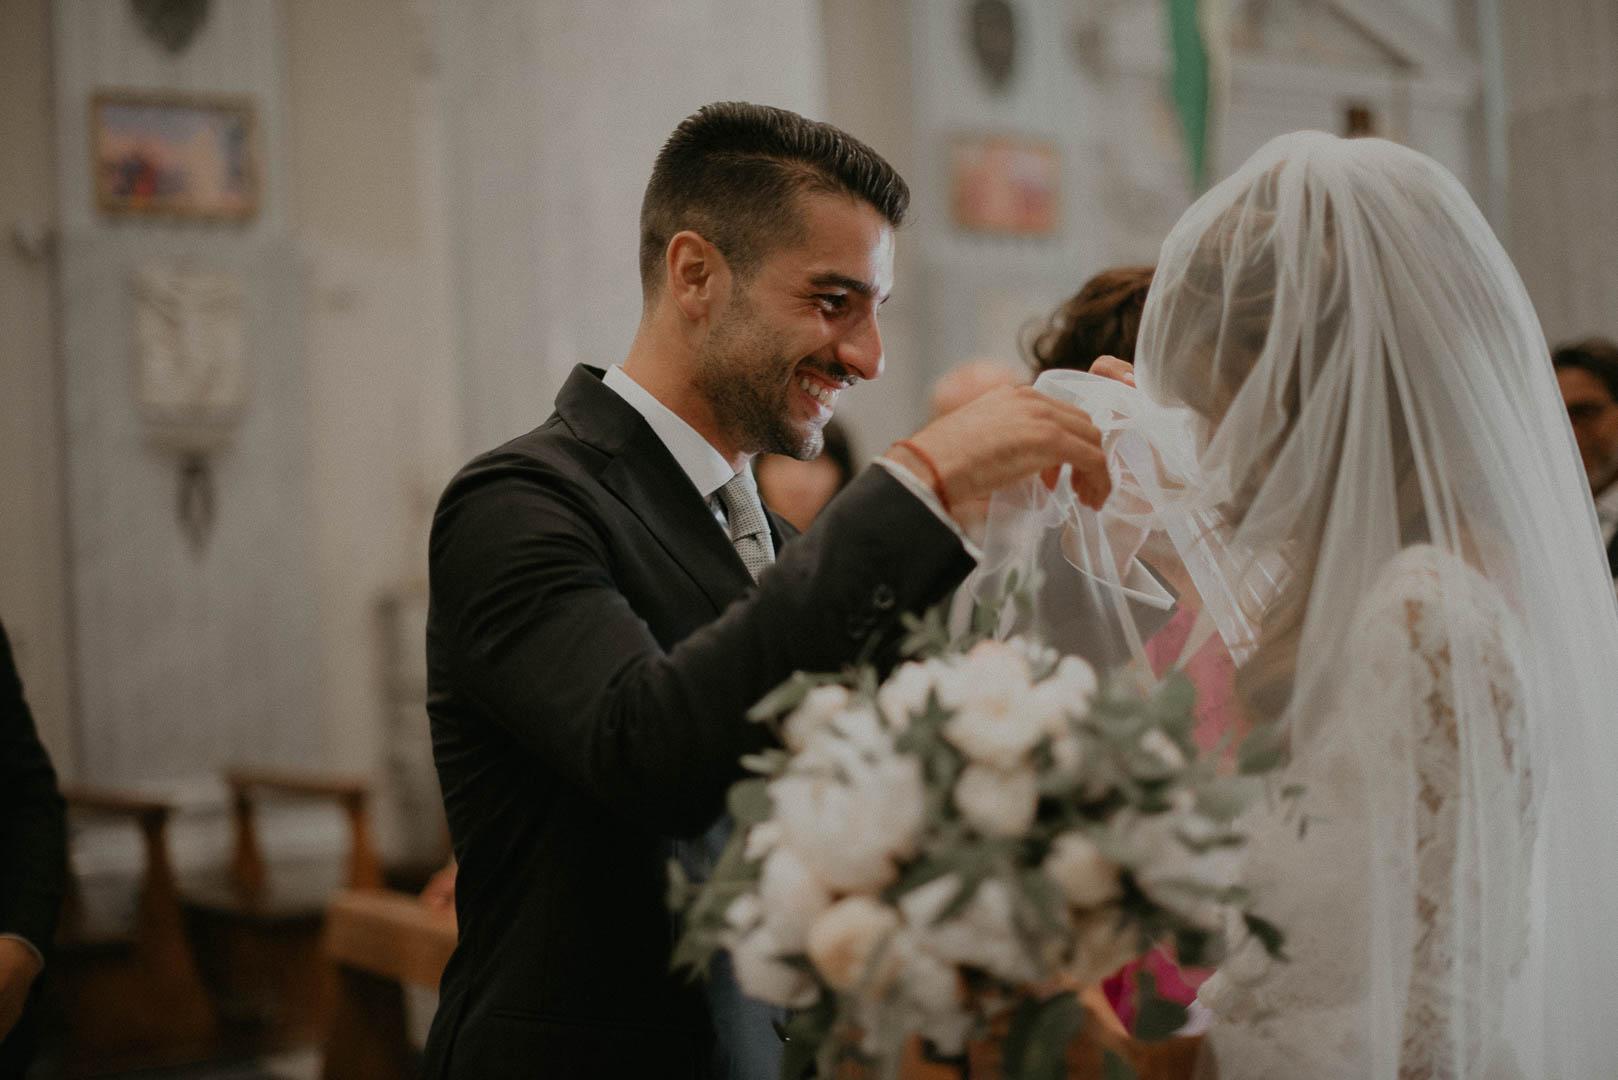 wedding-photographer-destination-fineart-bespoke-reportage-napoli-nabilah-vivianeizzo-spazio46-60